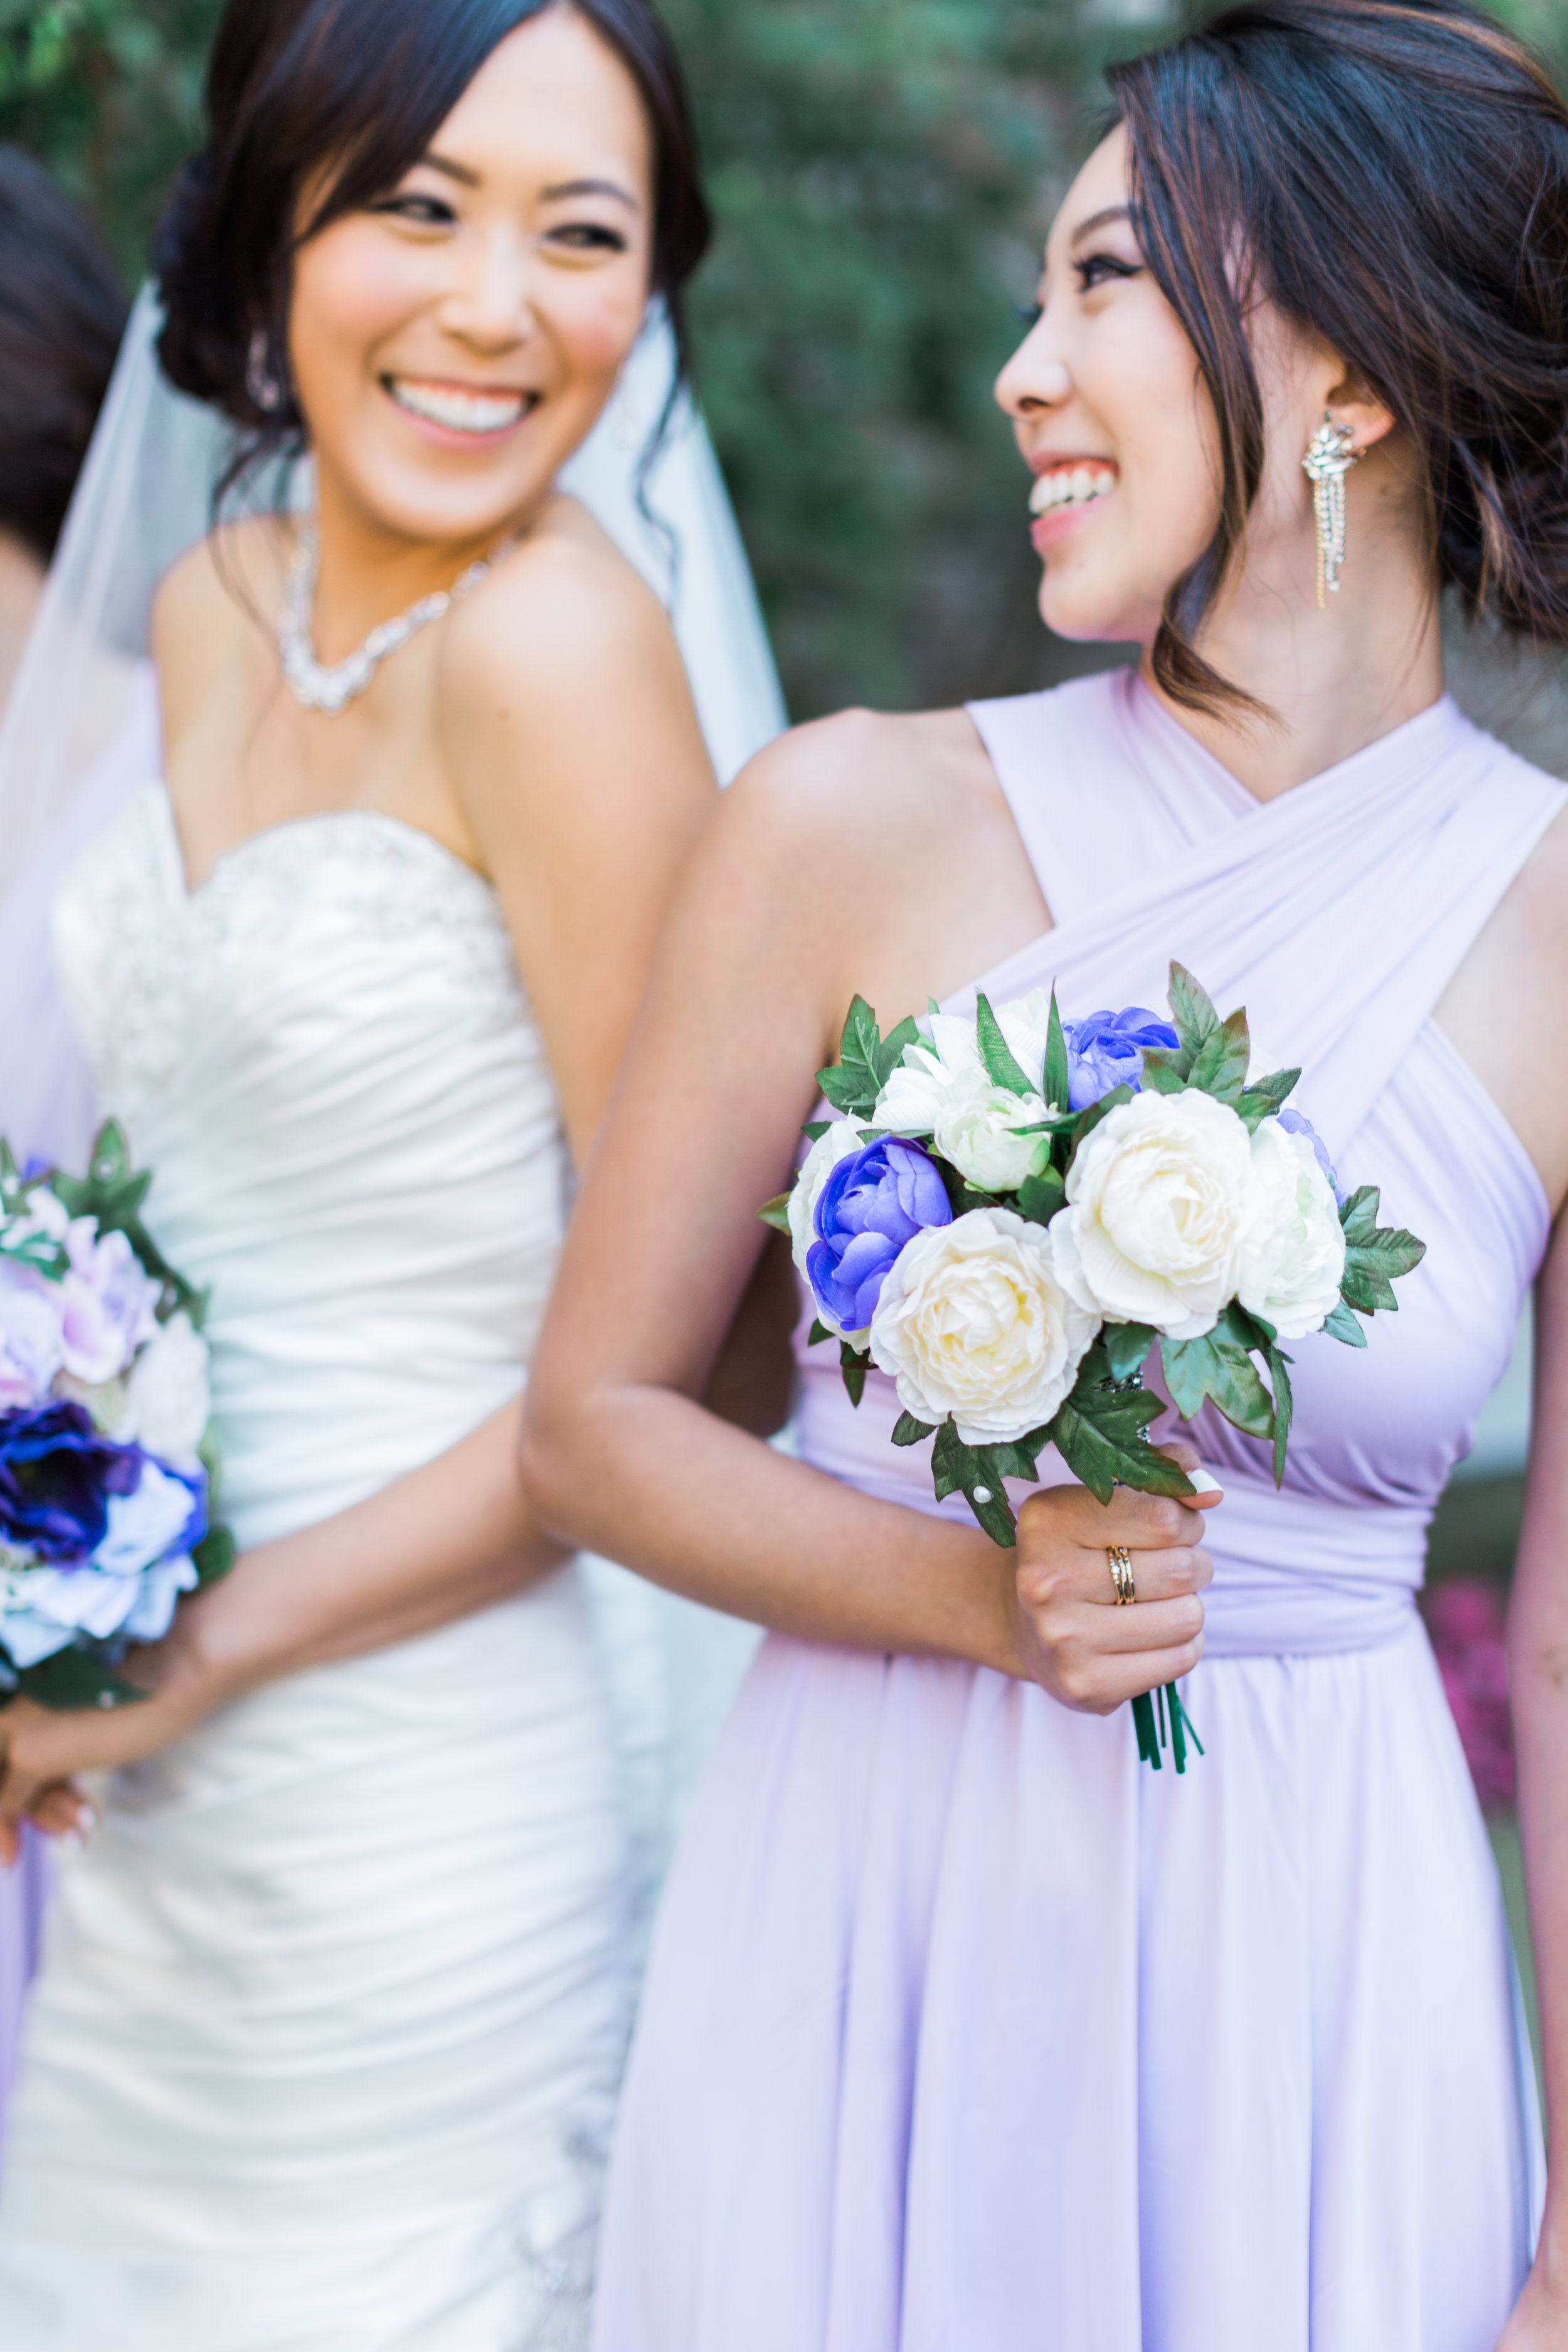 Toronto Fine Art Photographer - Old Mill Wedding - Bridesmaids Photos-8.jpg